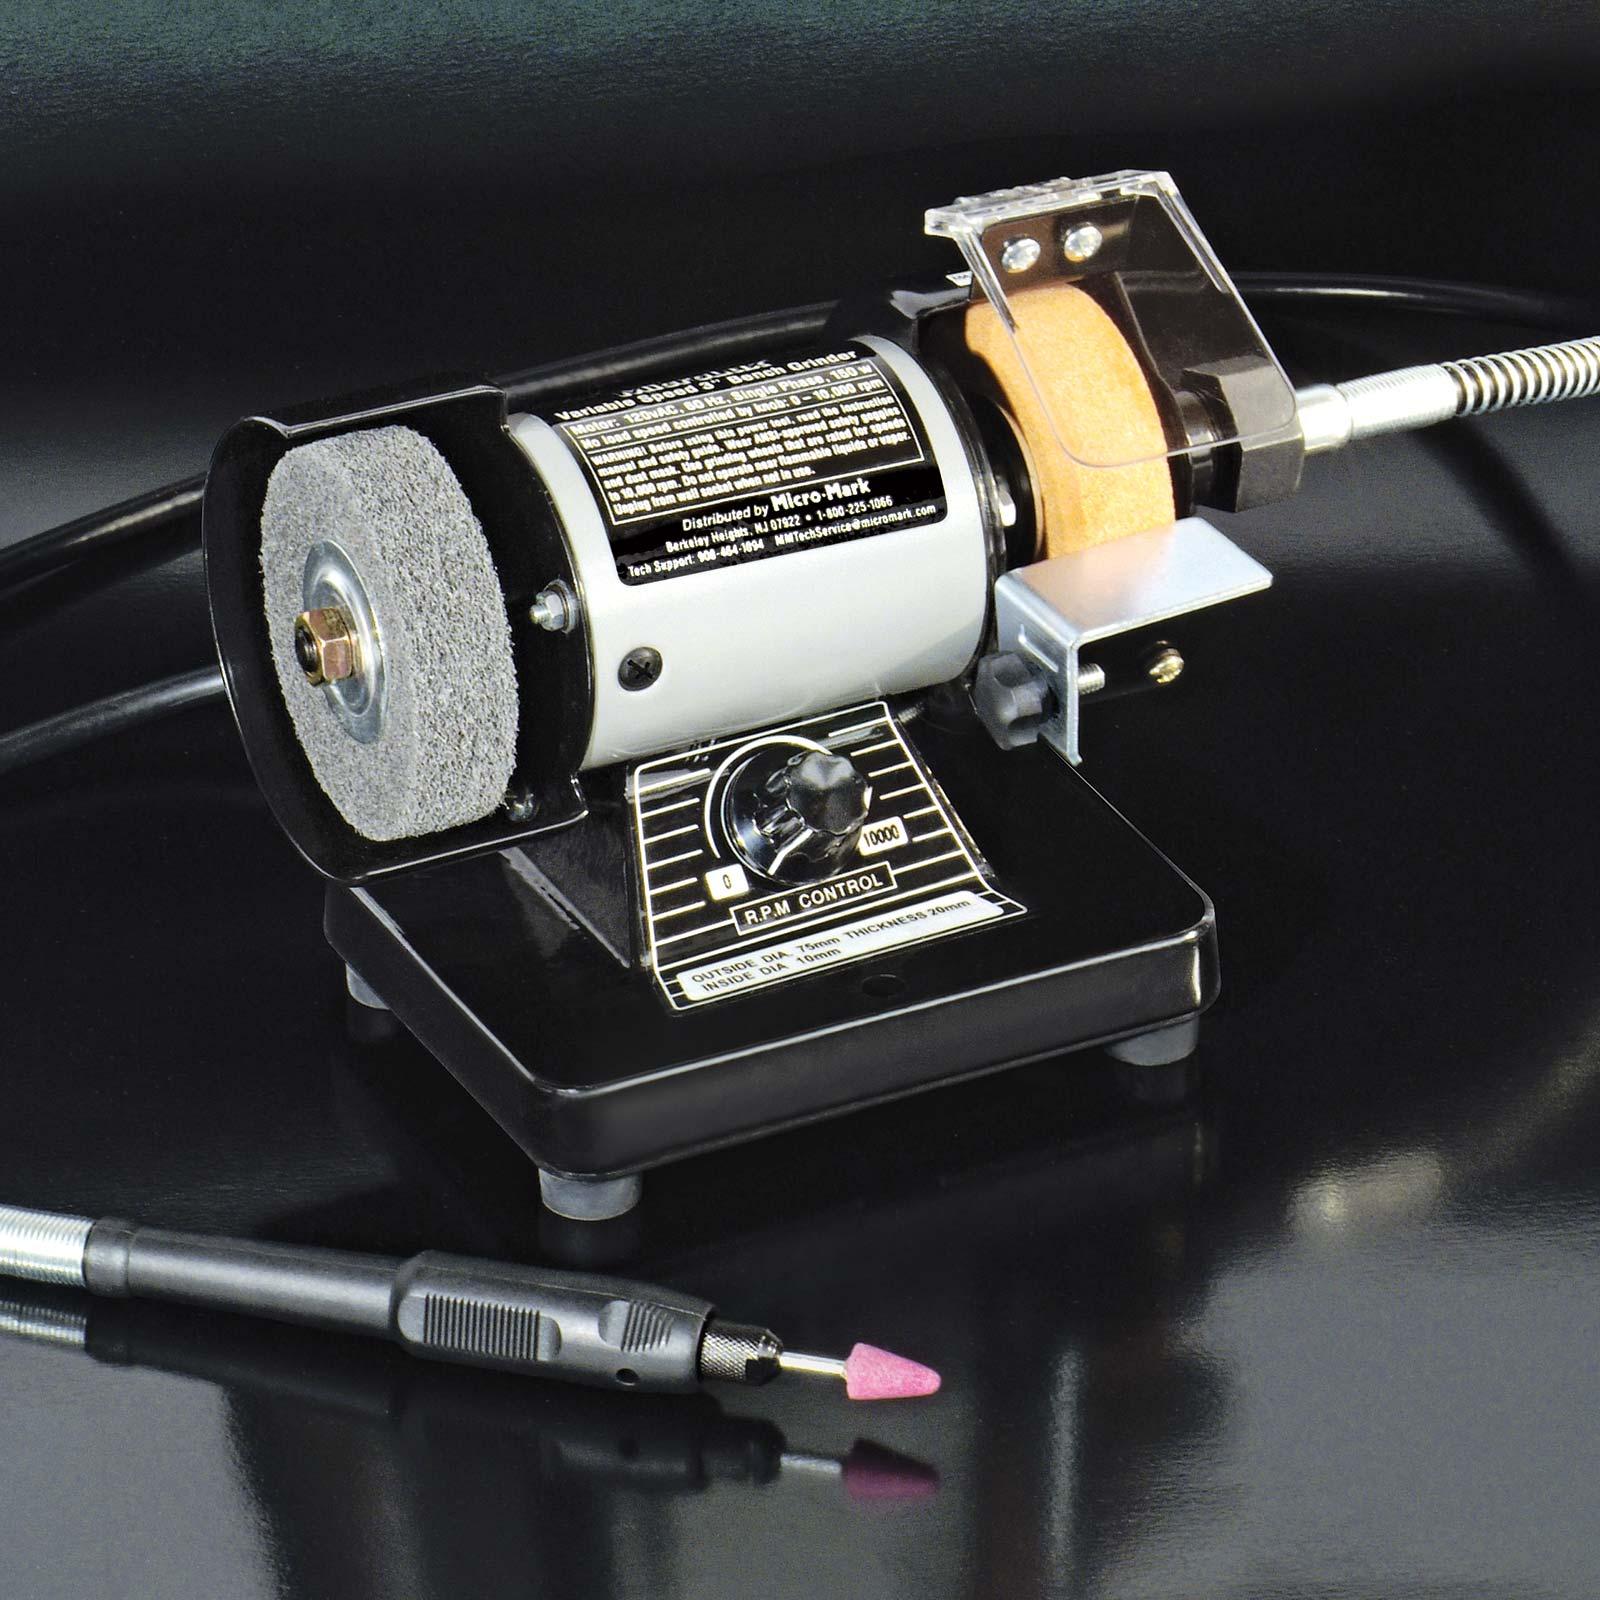 Miniature Bench Grinder With Flex Shaft Attachment